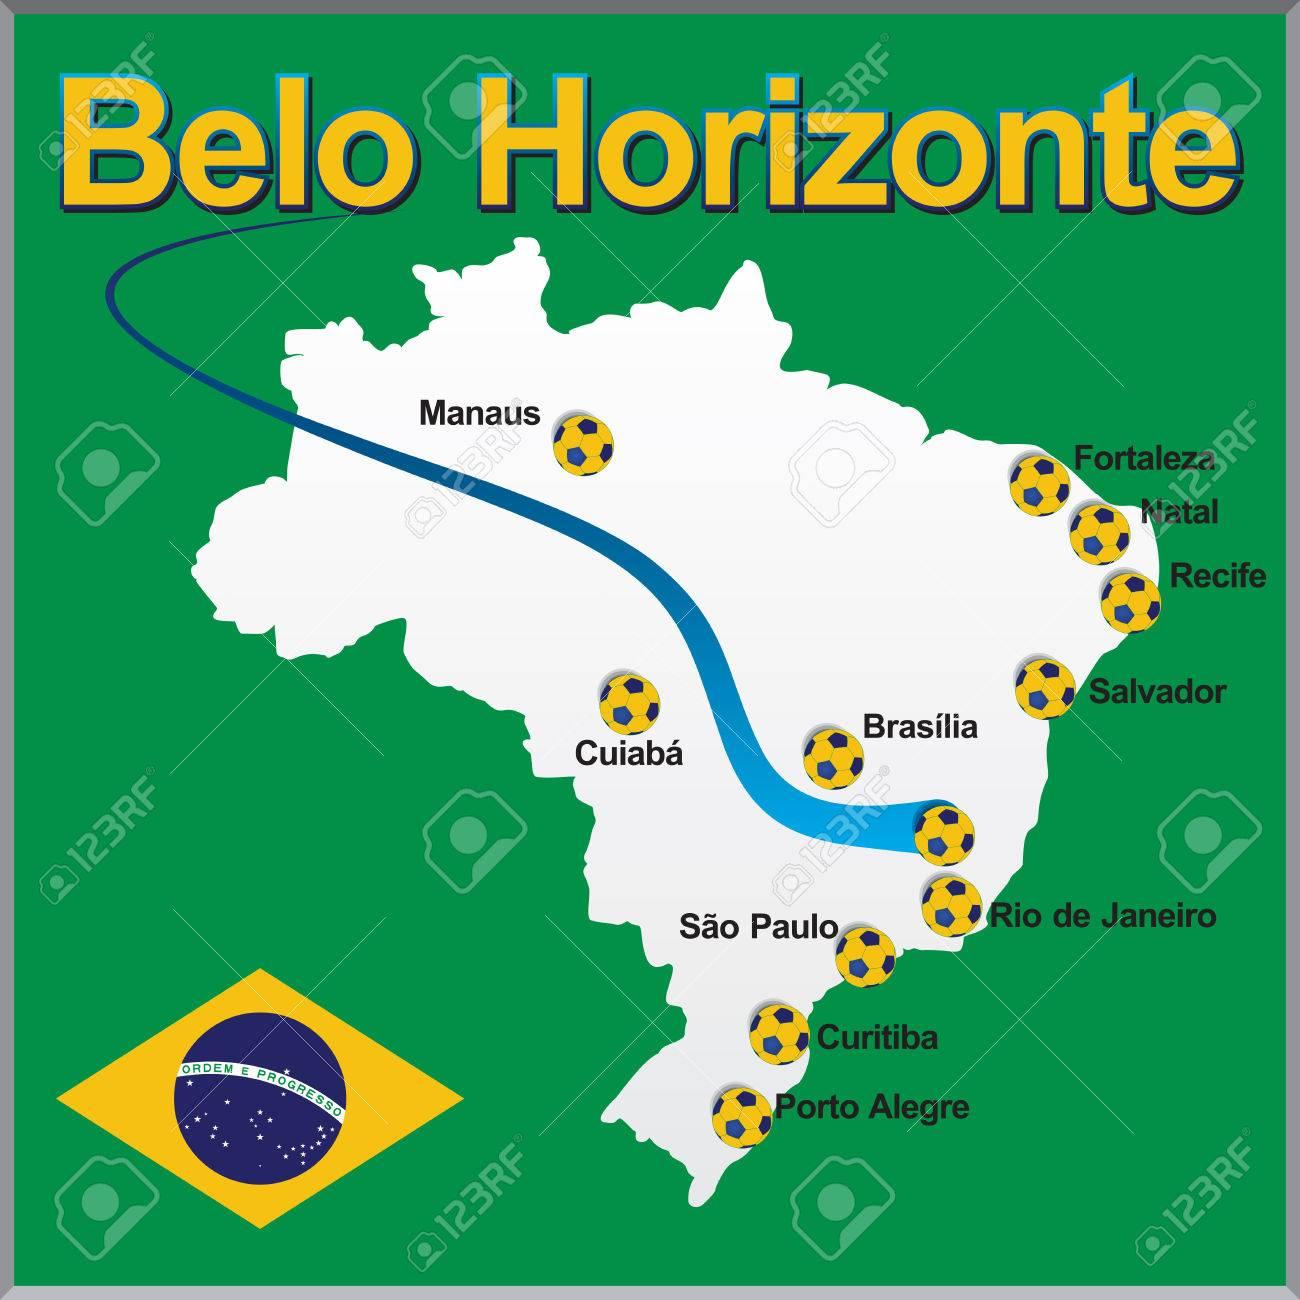 Belo Horizonte Brazil Map Soccer Ball Royalty Free Cliparts